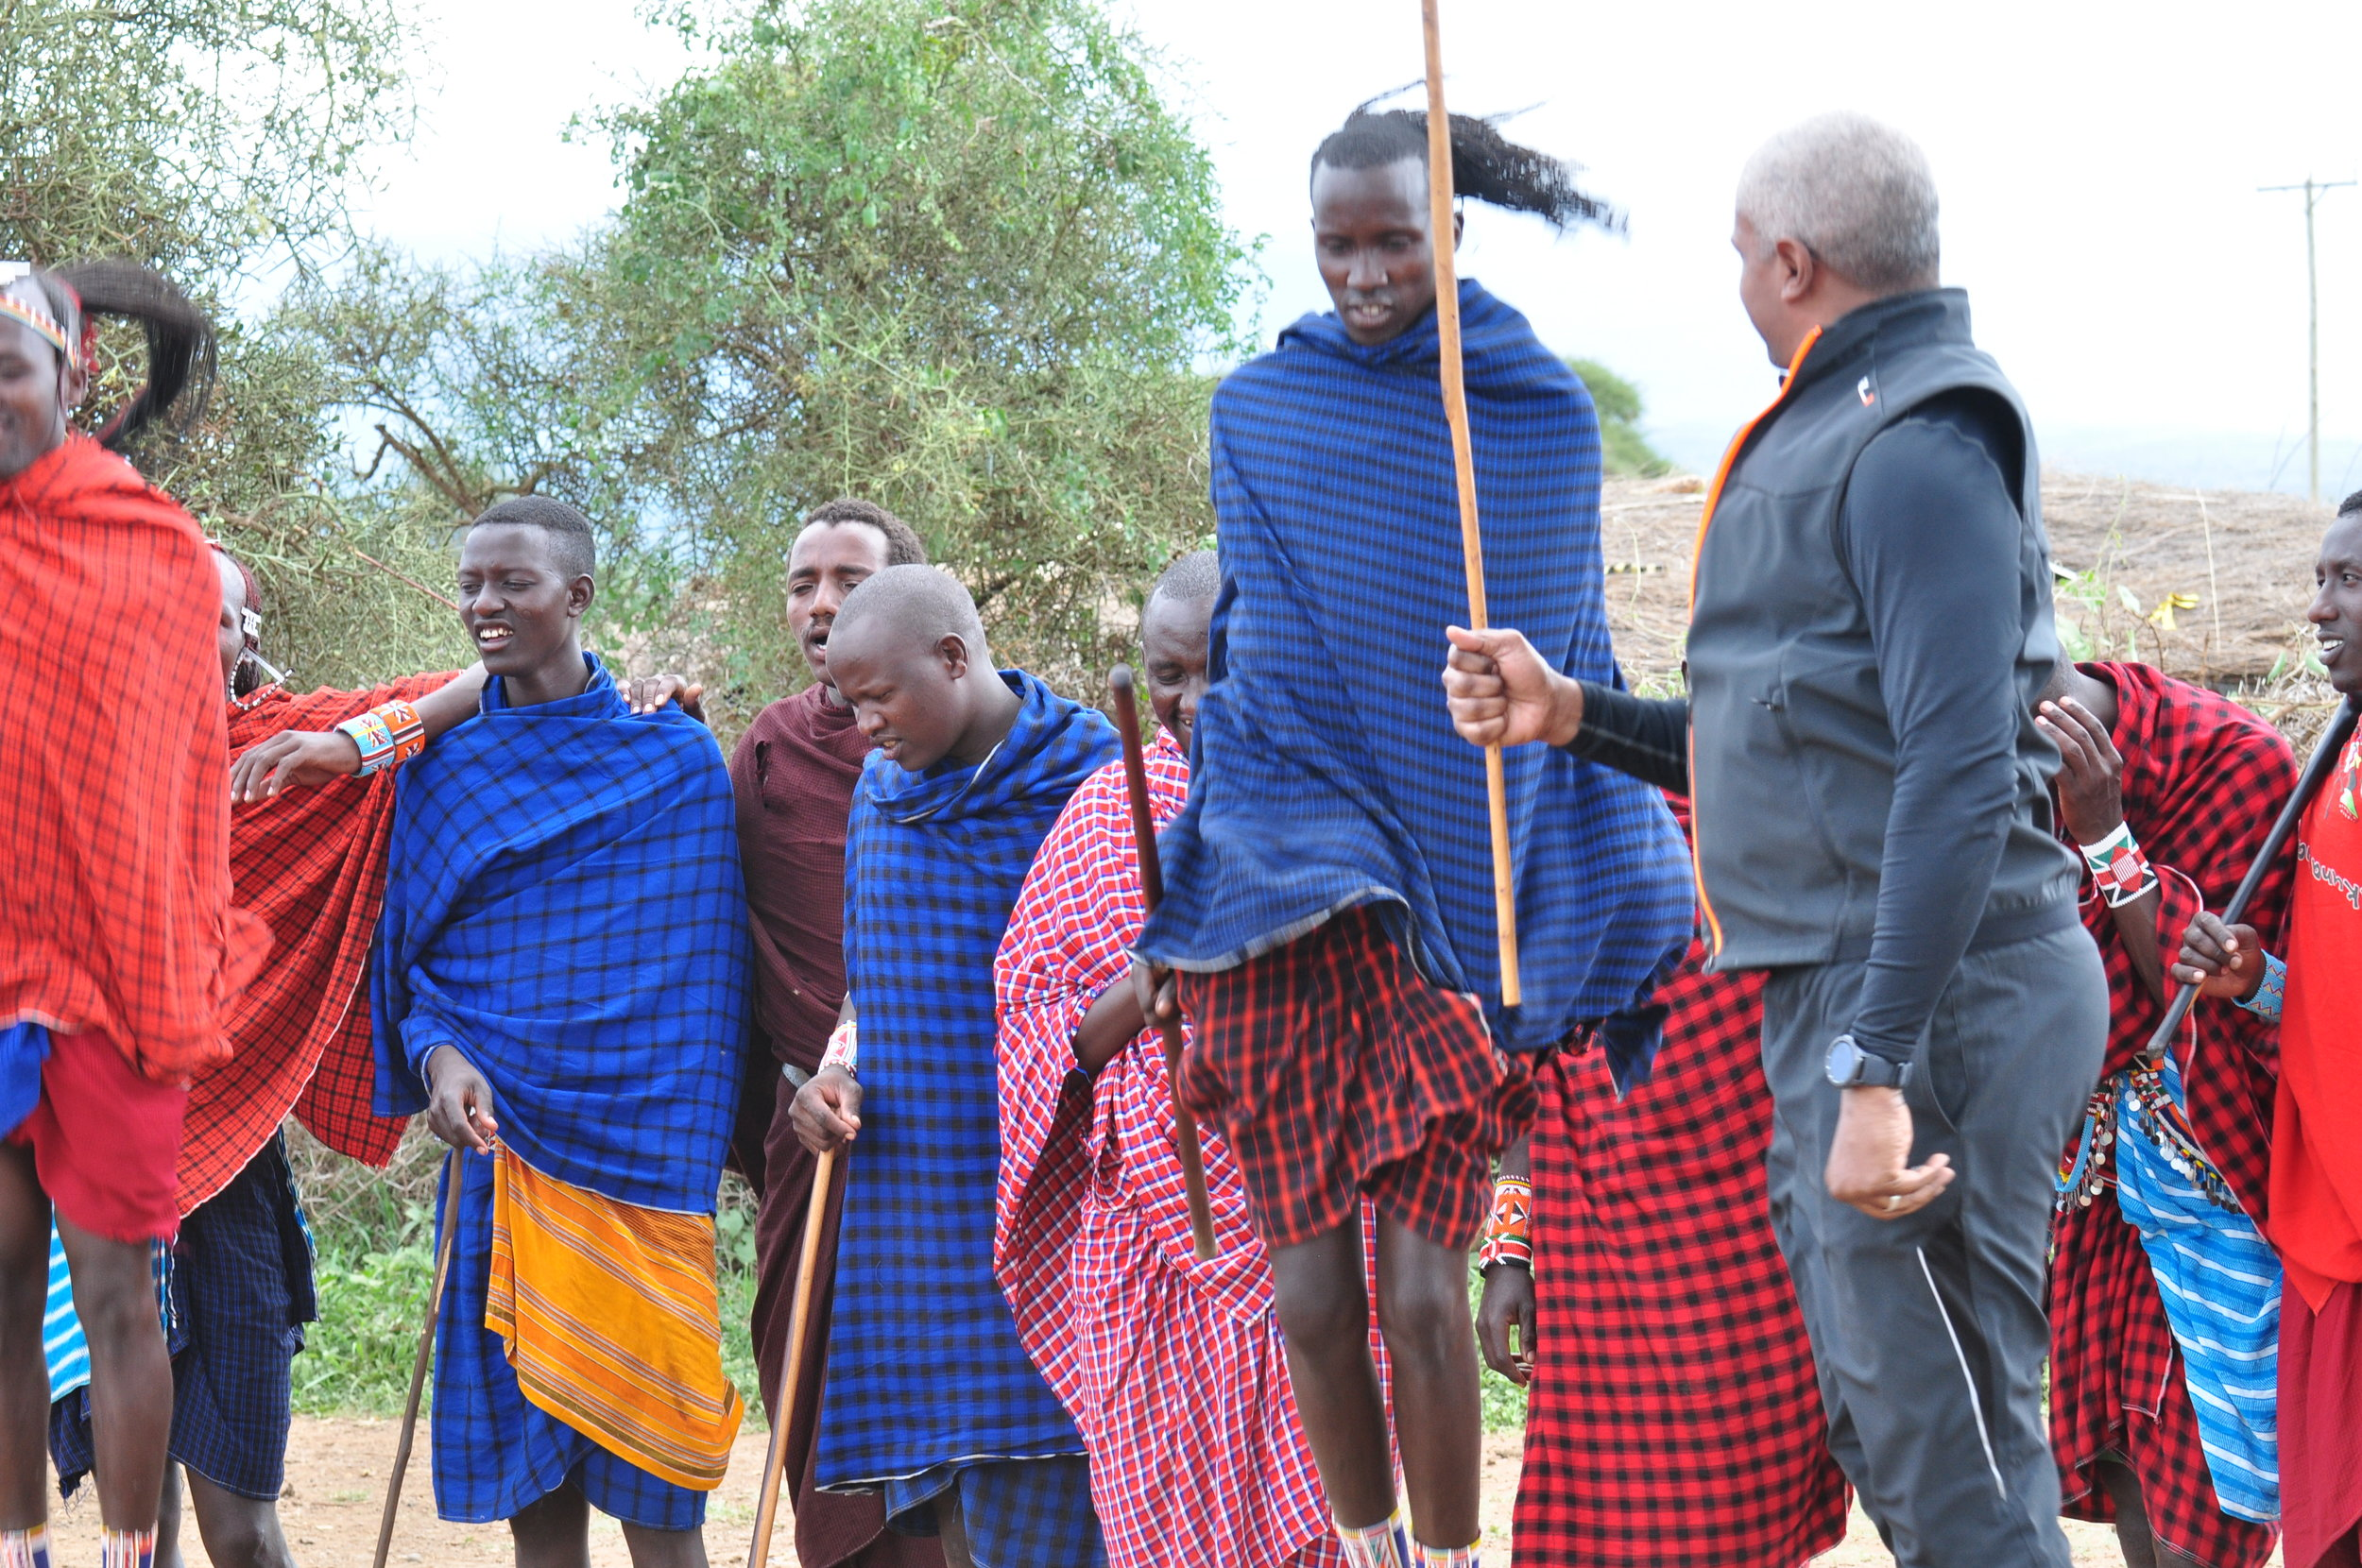 Maasai village, Amboseli, Rift Valley, Kenya